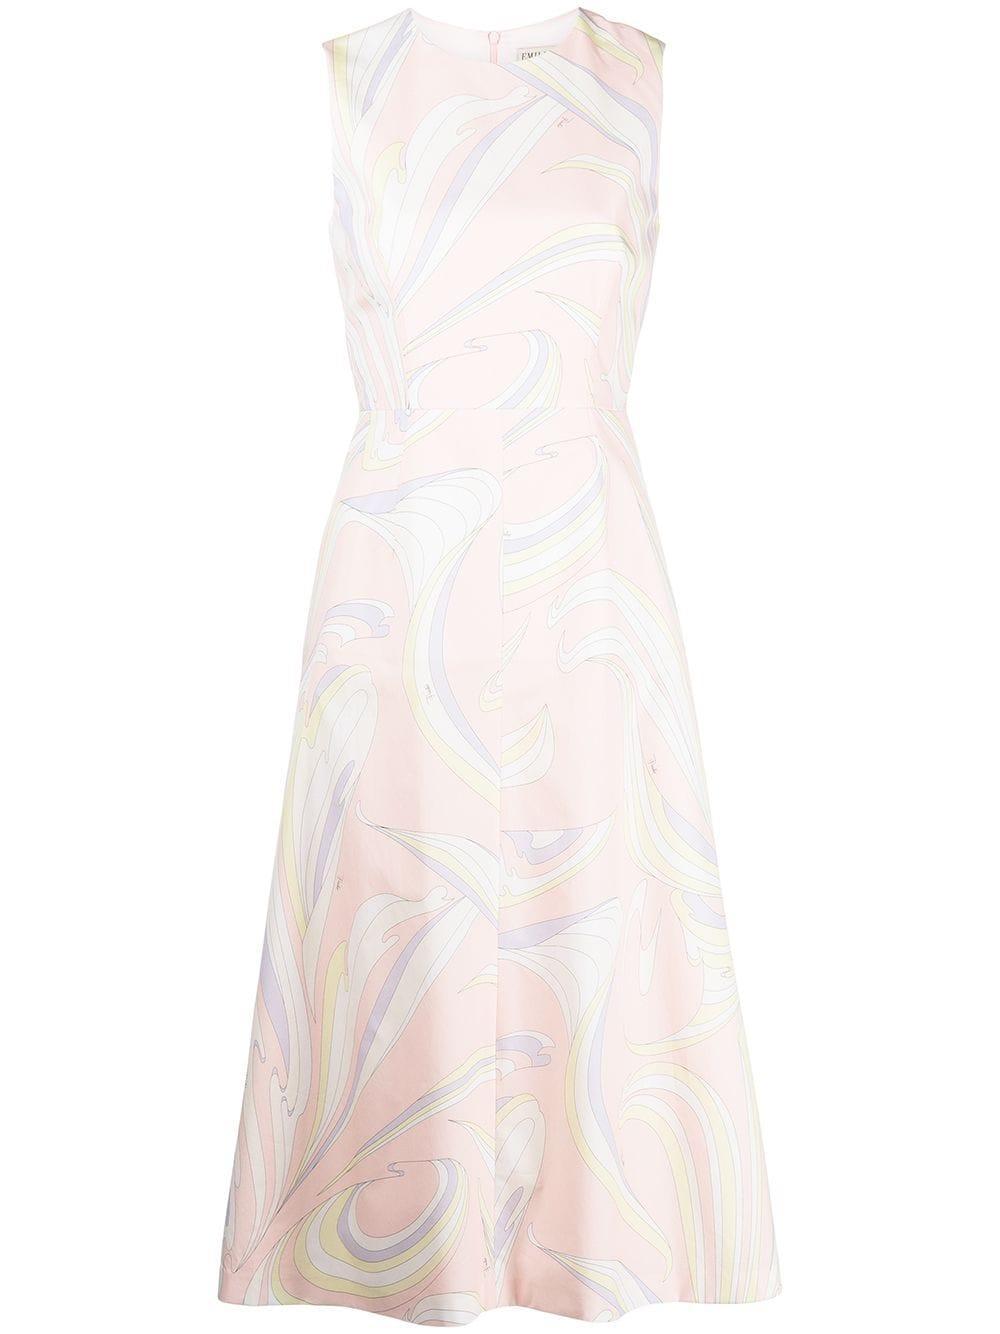 Printed Midi Dress Item # 1RRH12-1R743